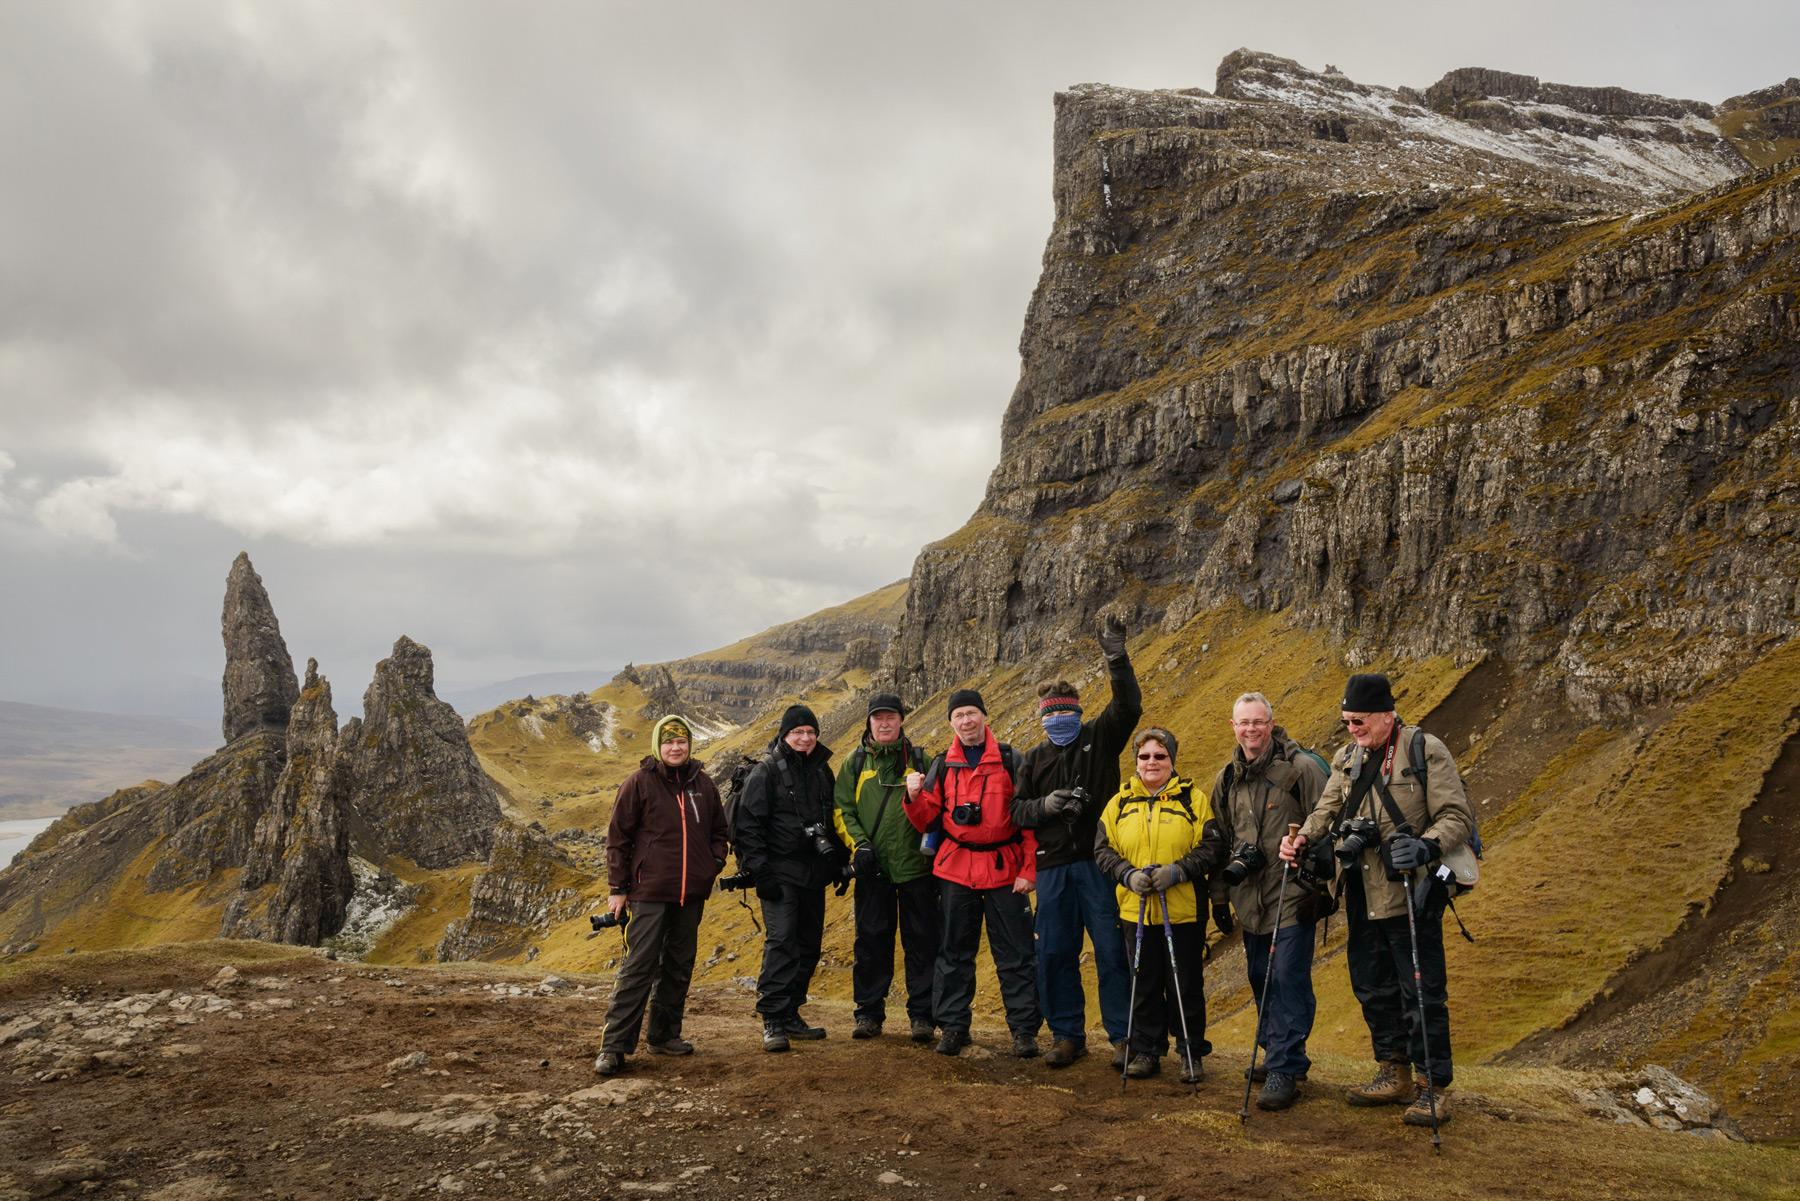 Skye Gang, Skye Fotoreise, Schottland